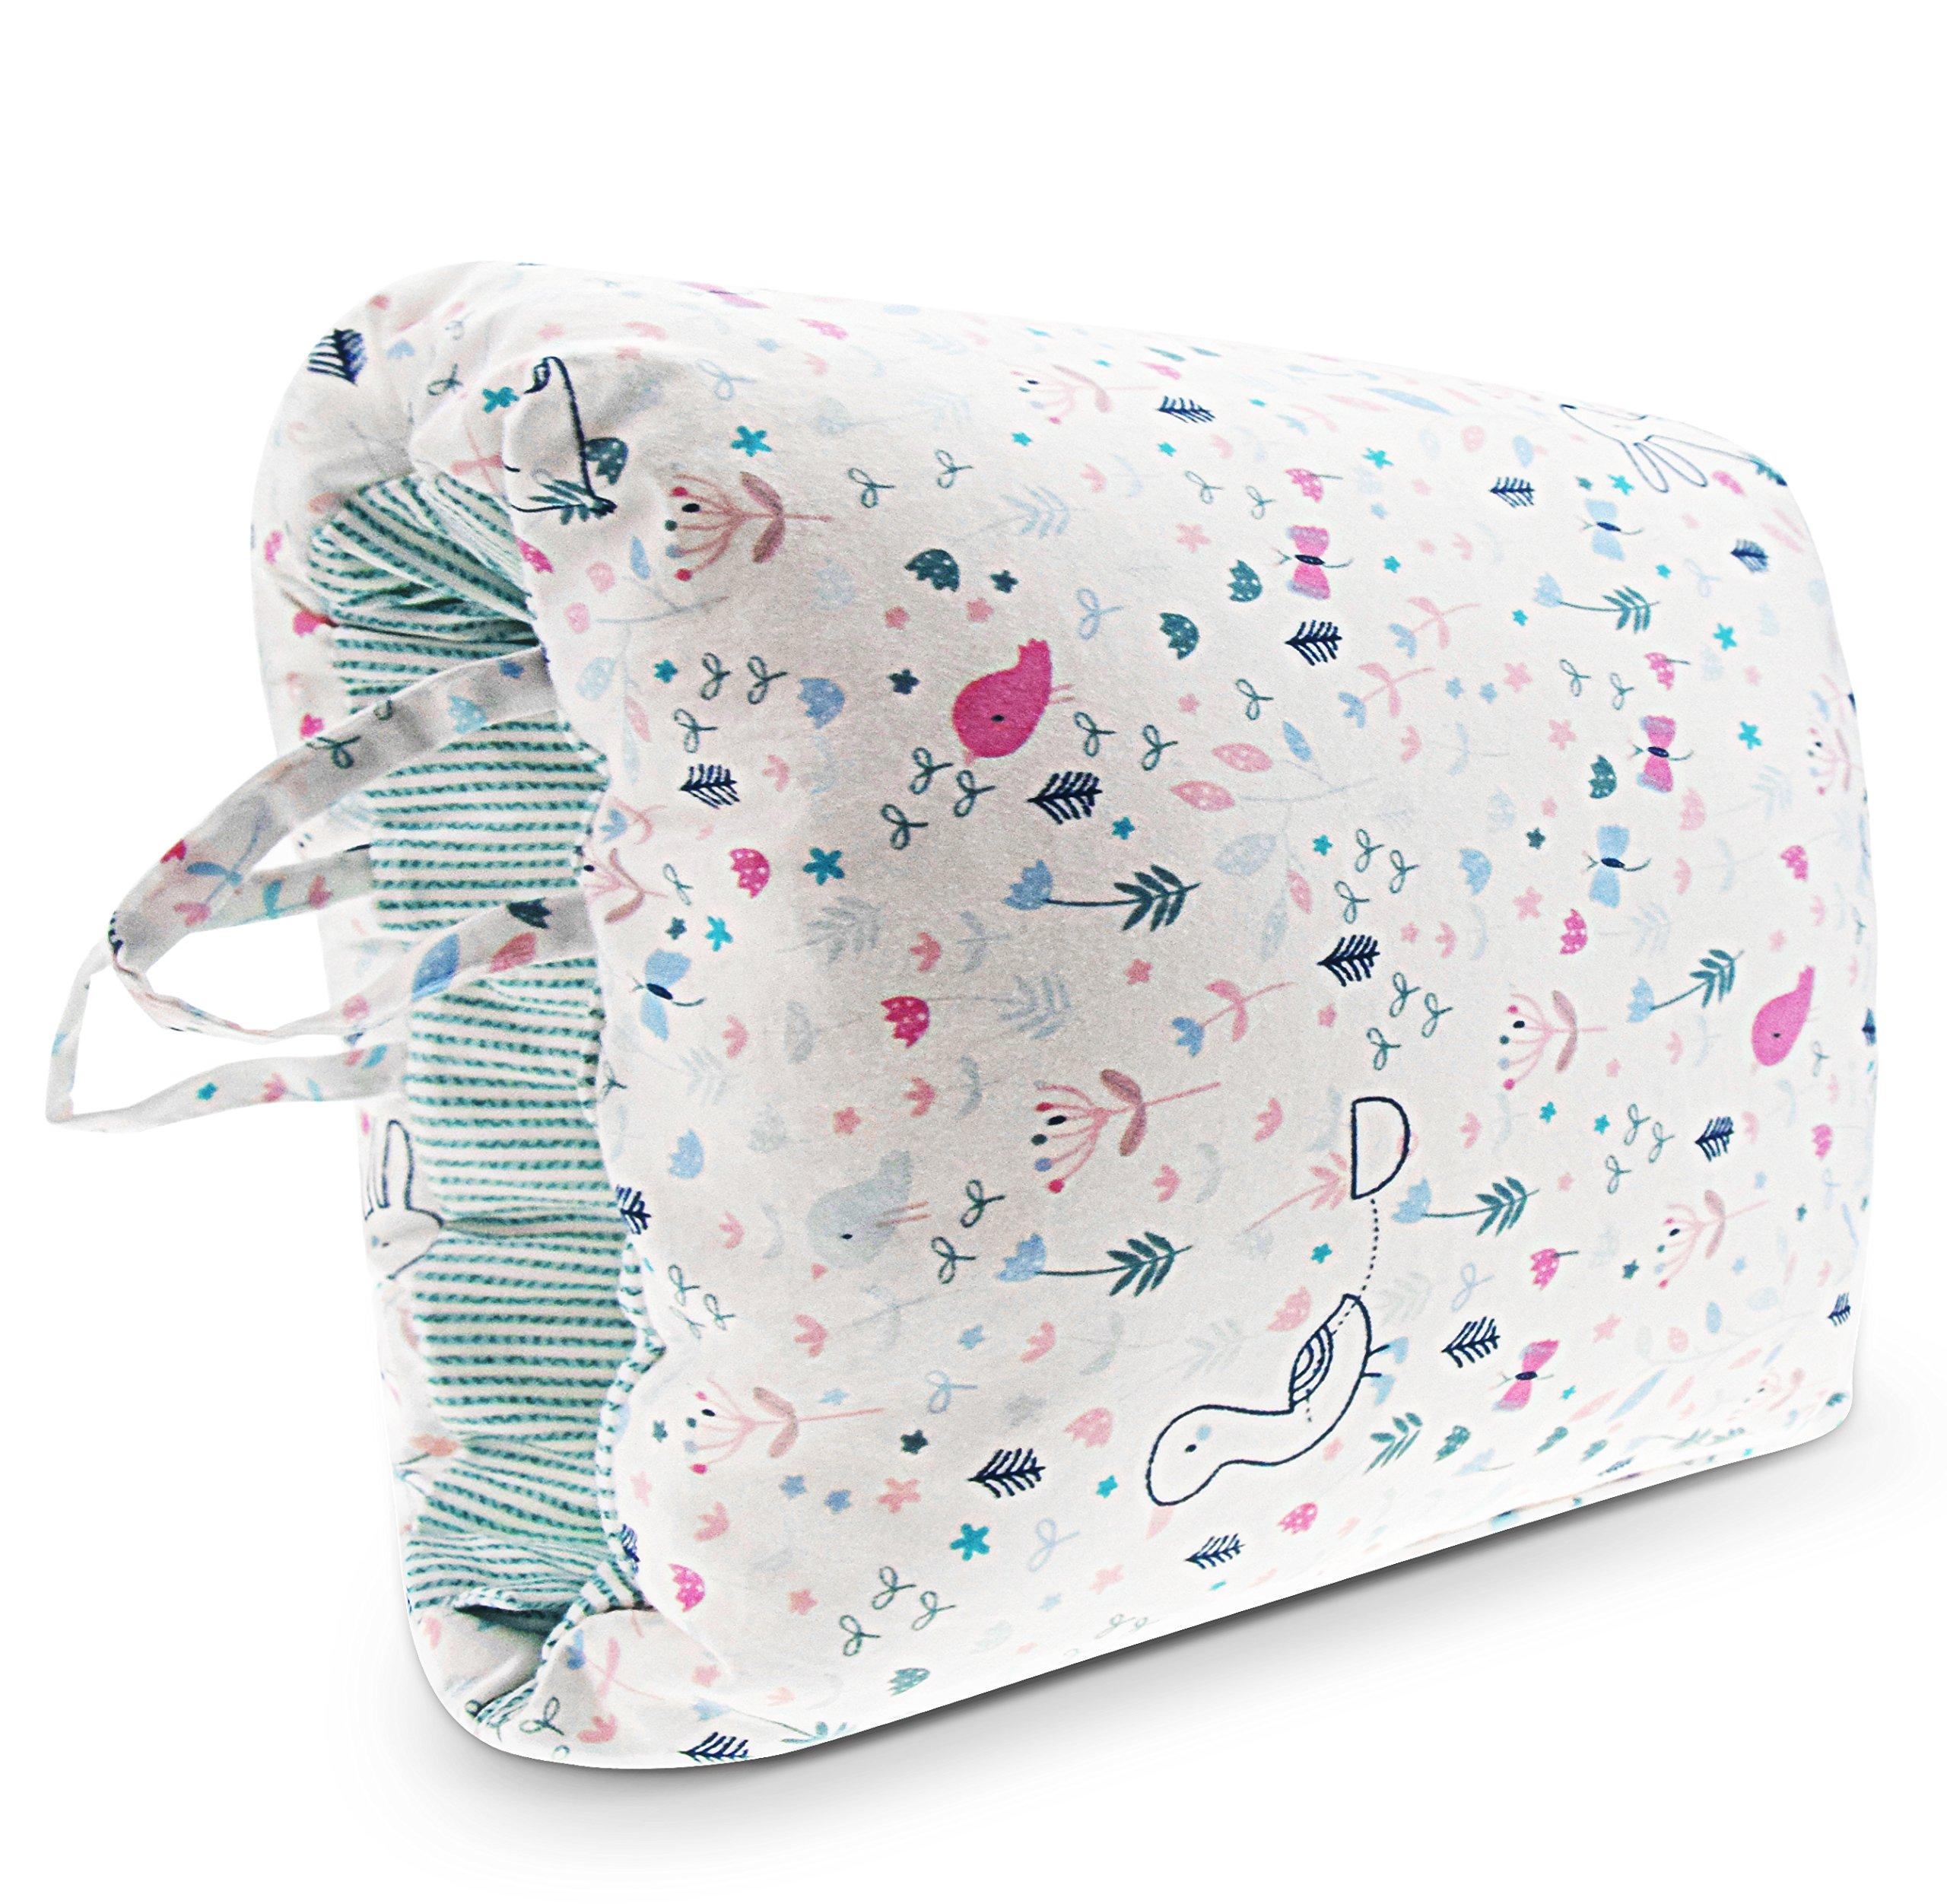 Epltion Travel Nursing Pillow for Breastfeeding/Arm Breastfeeding Pillow for C-Sections Mom/Portable Washable Nursing Pillow Rabbit